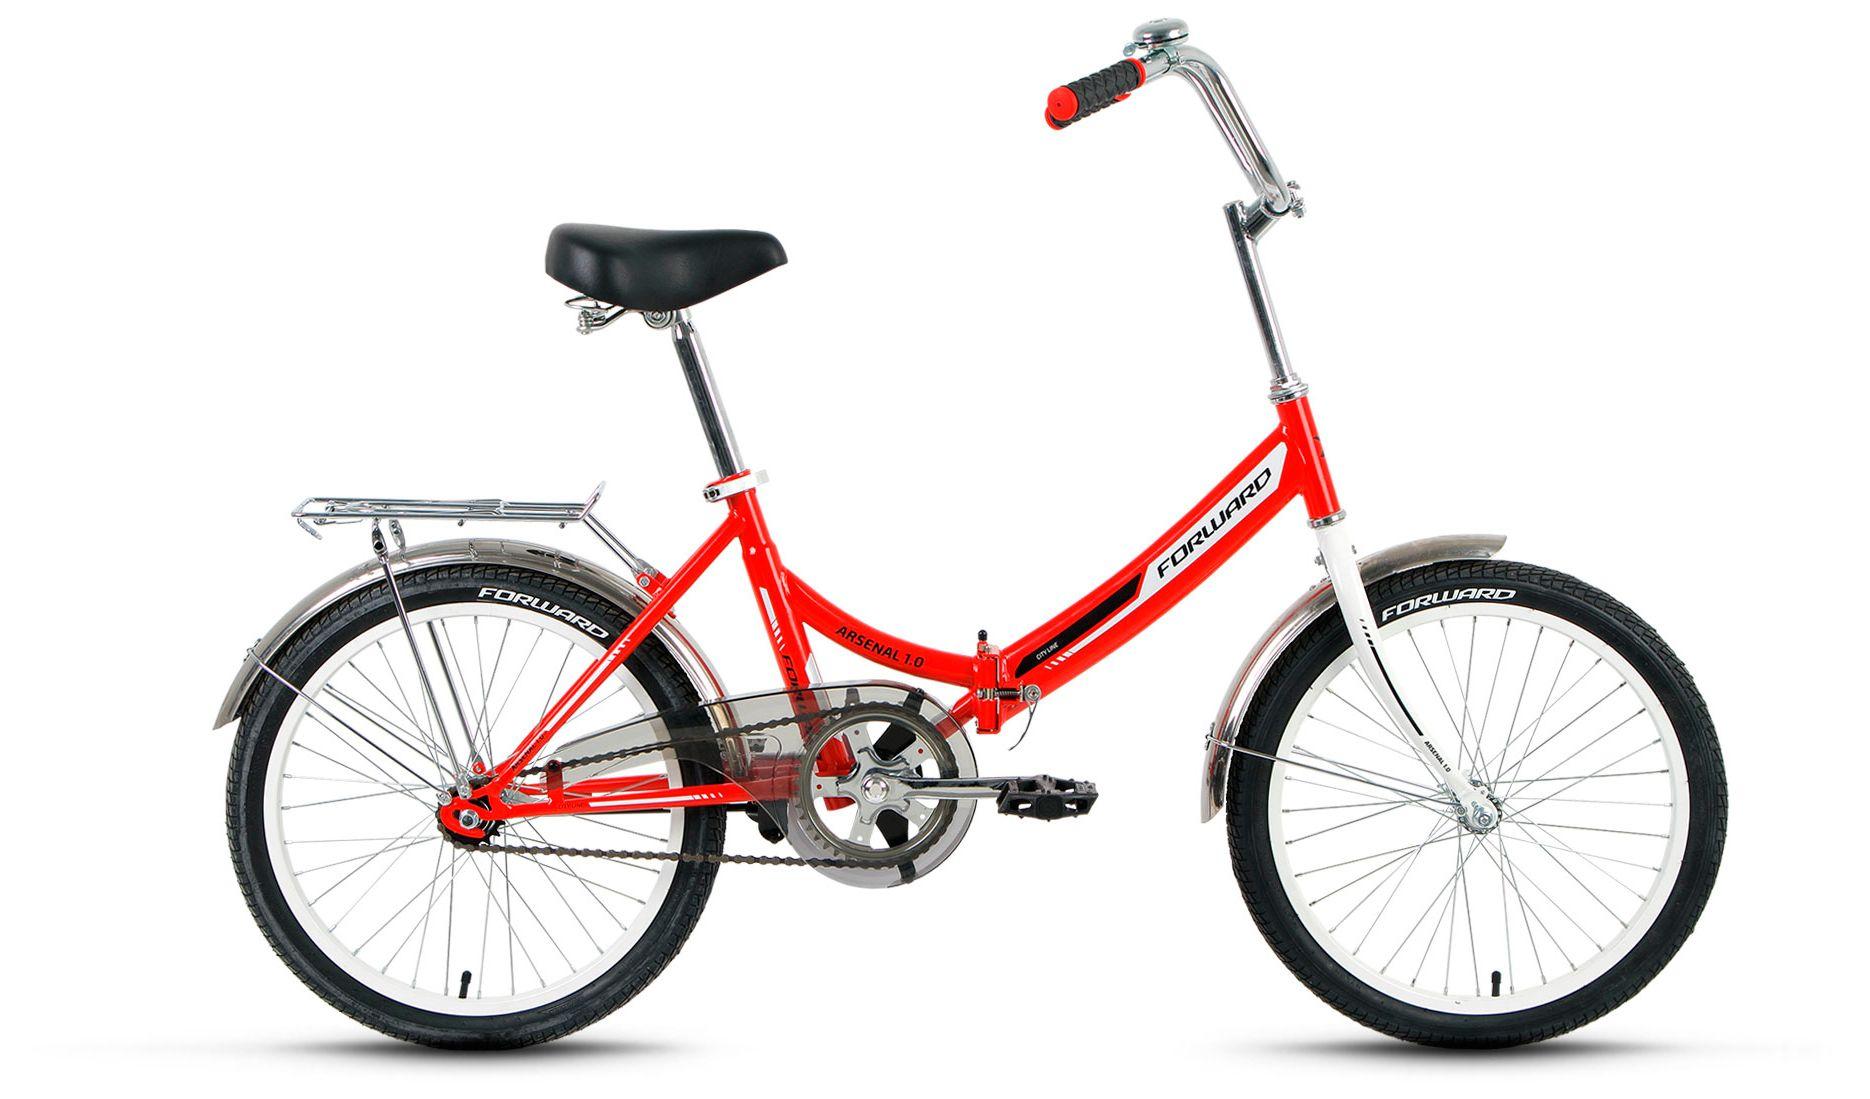 Велосипед Forward Arsenal 1.0 2017 велосипед forward arsenal 101 2013